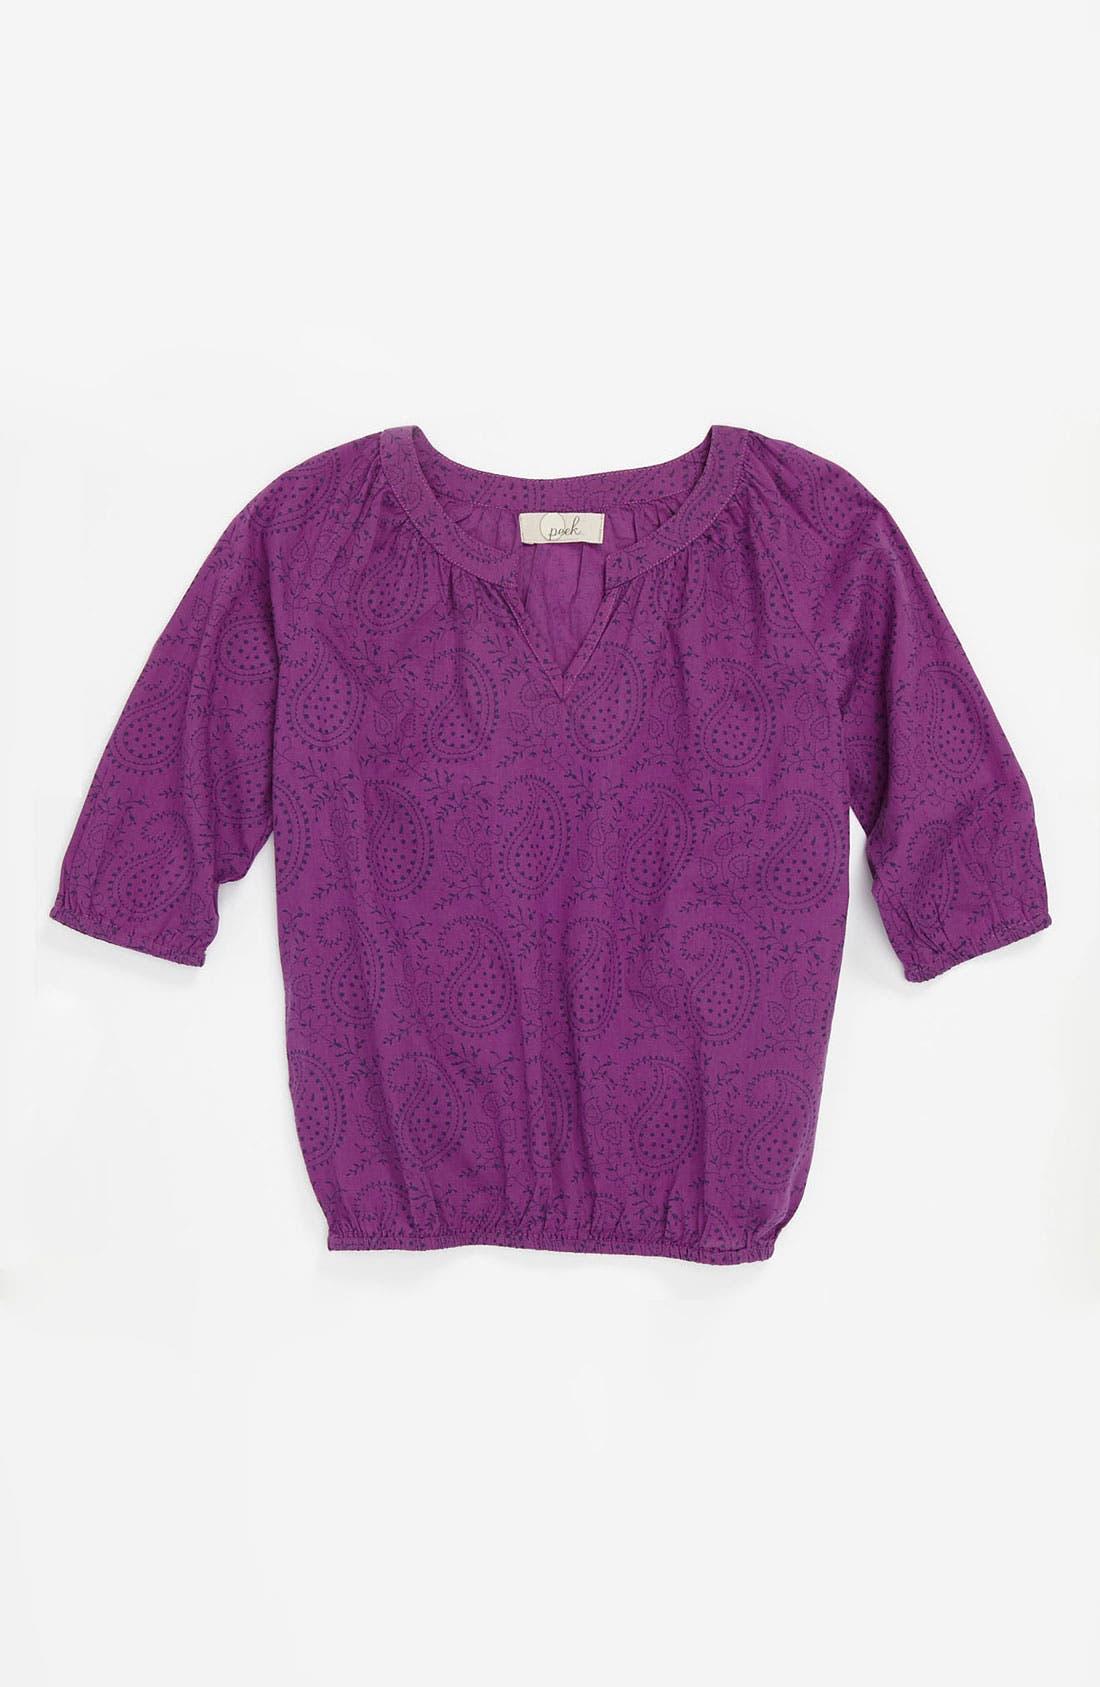 Alternate Image 1 Selected - Peek 'Murano' Top (Toddler, Little Girls & Big Girls)